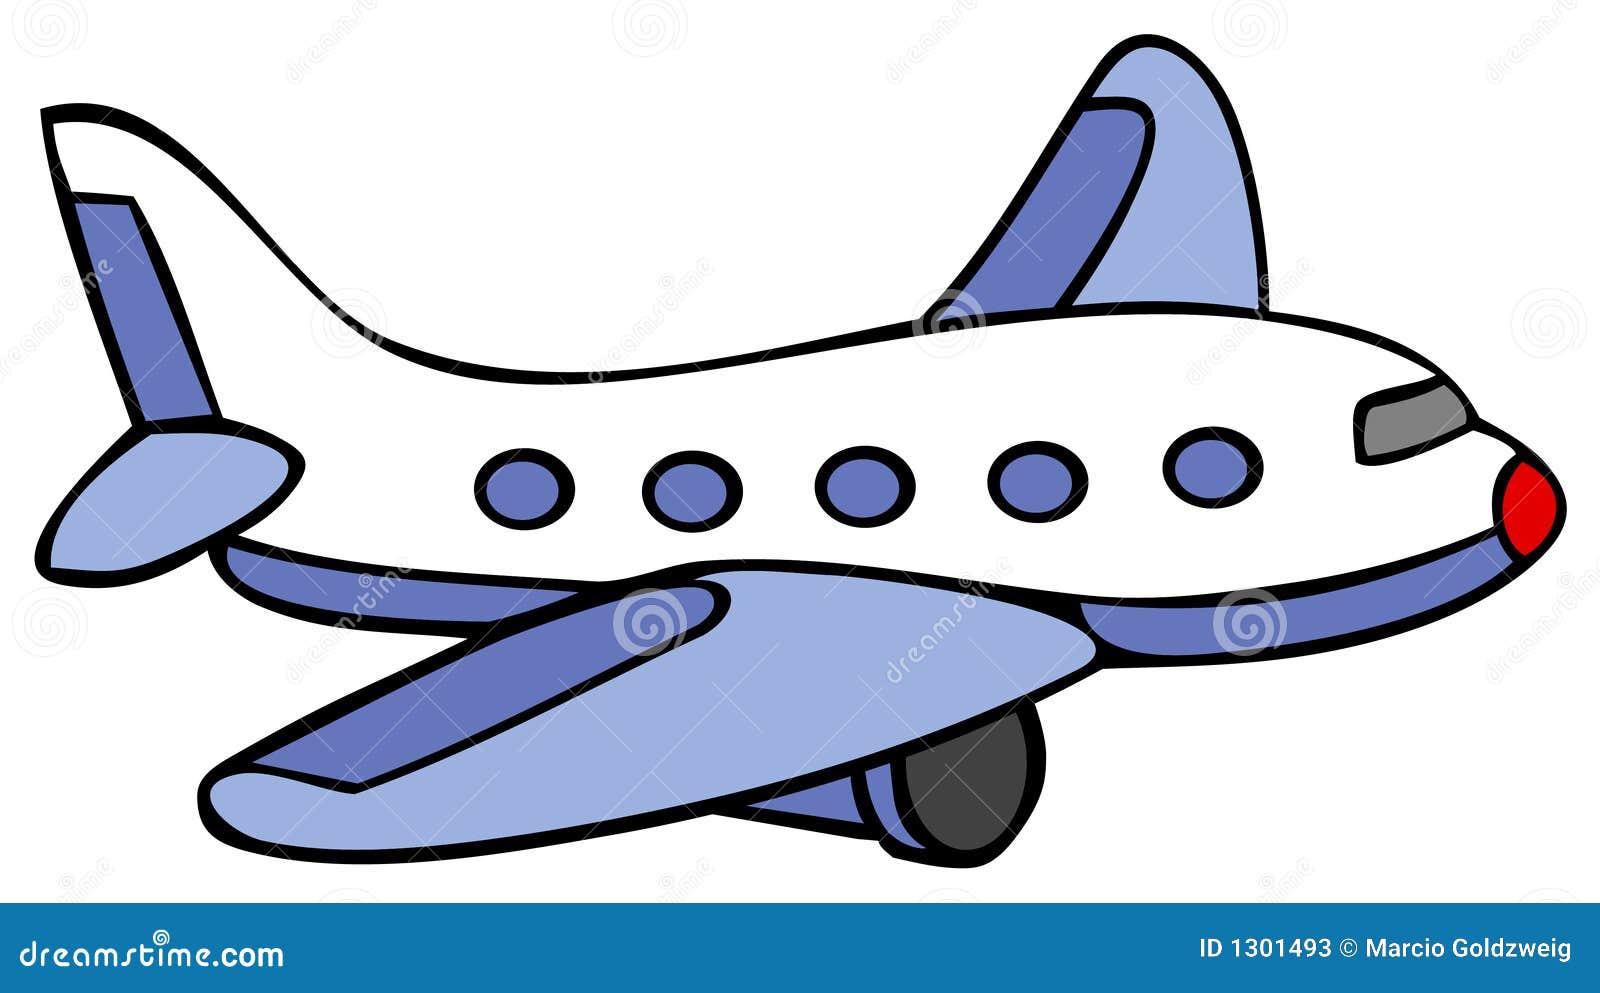 Flugzeug - Karikatur